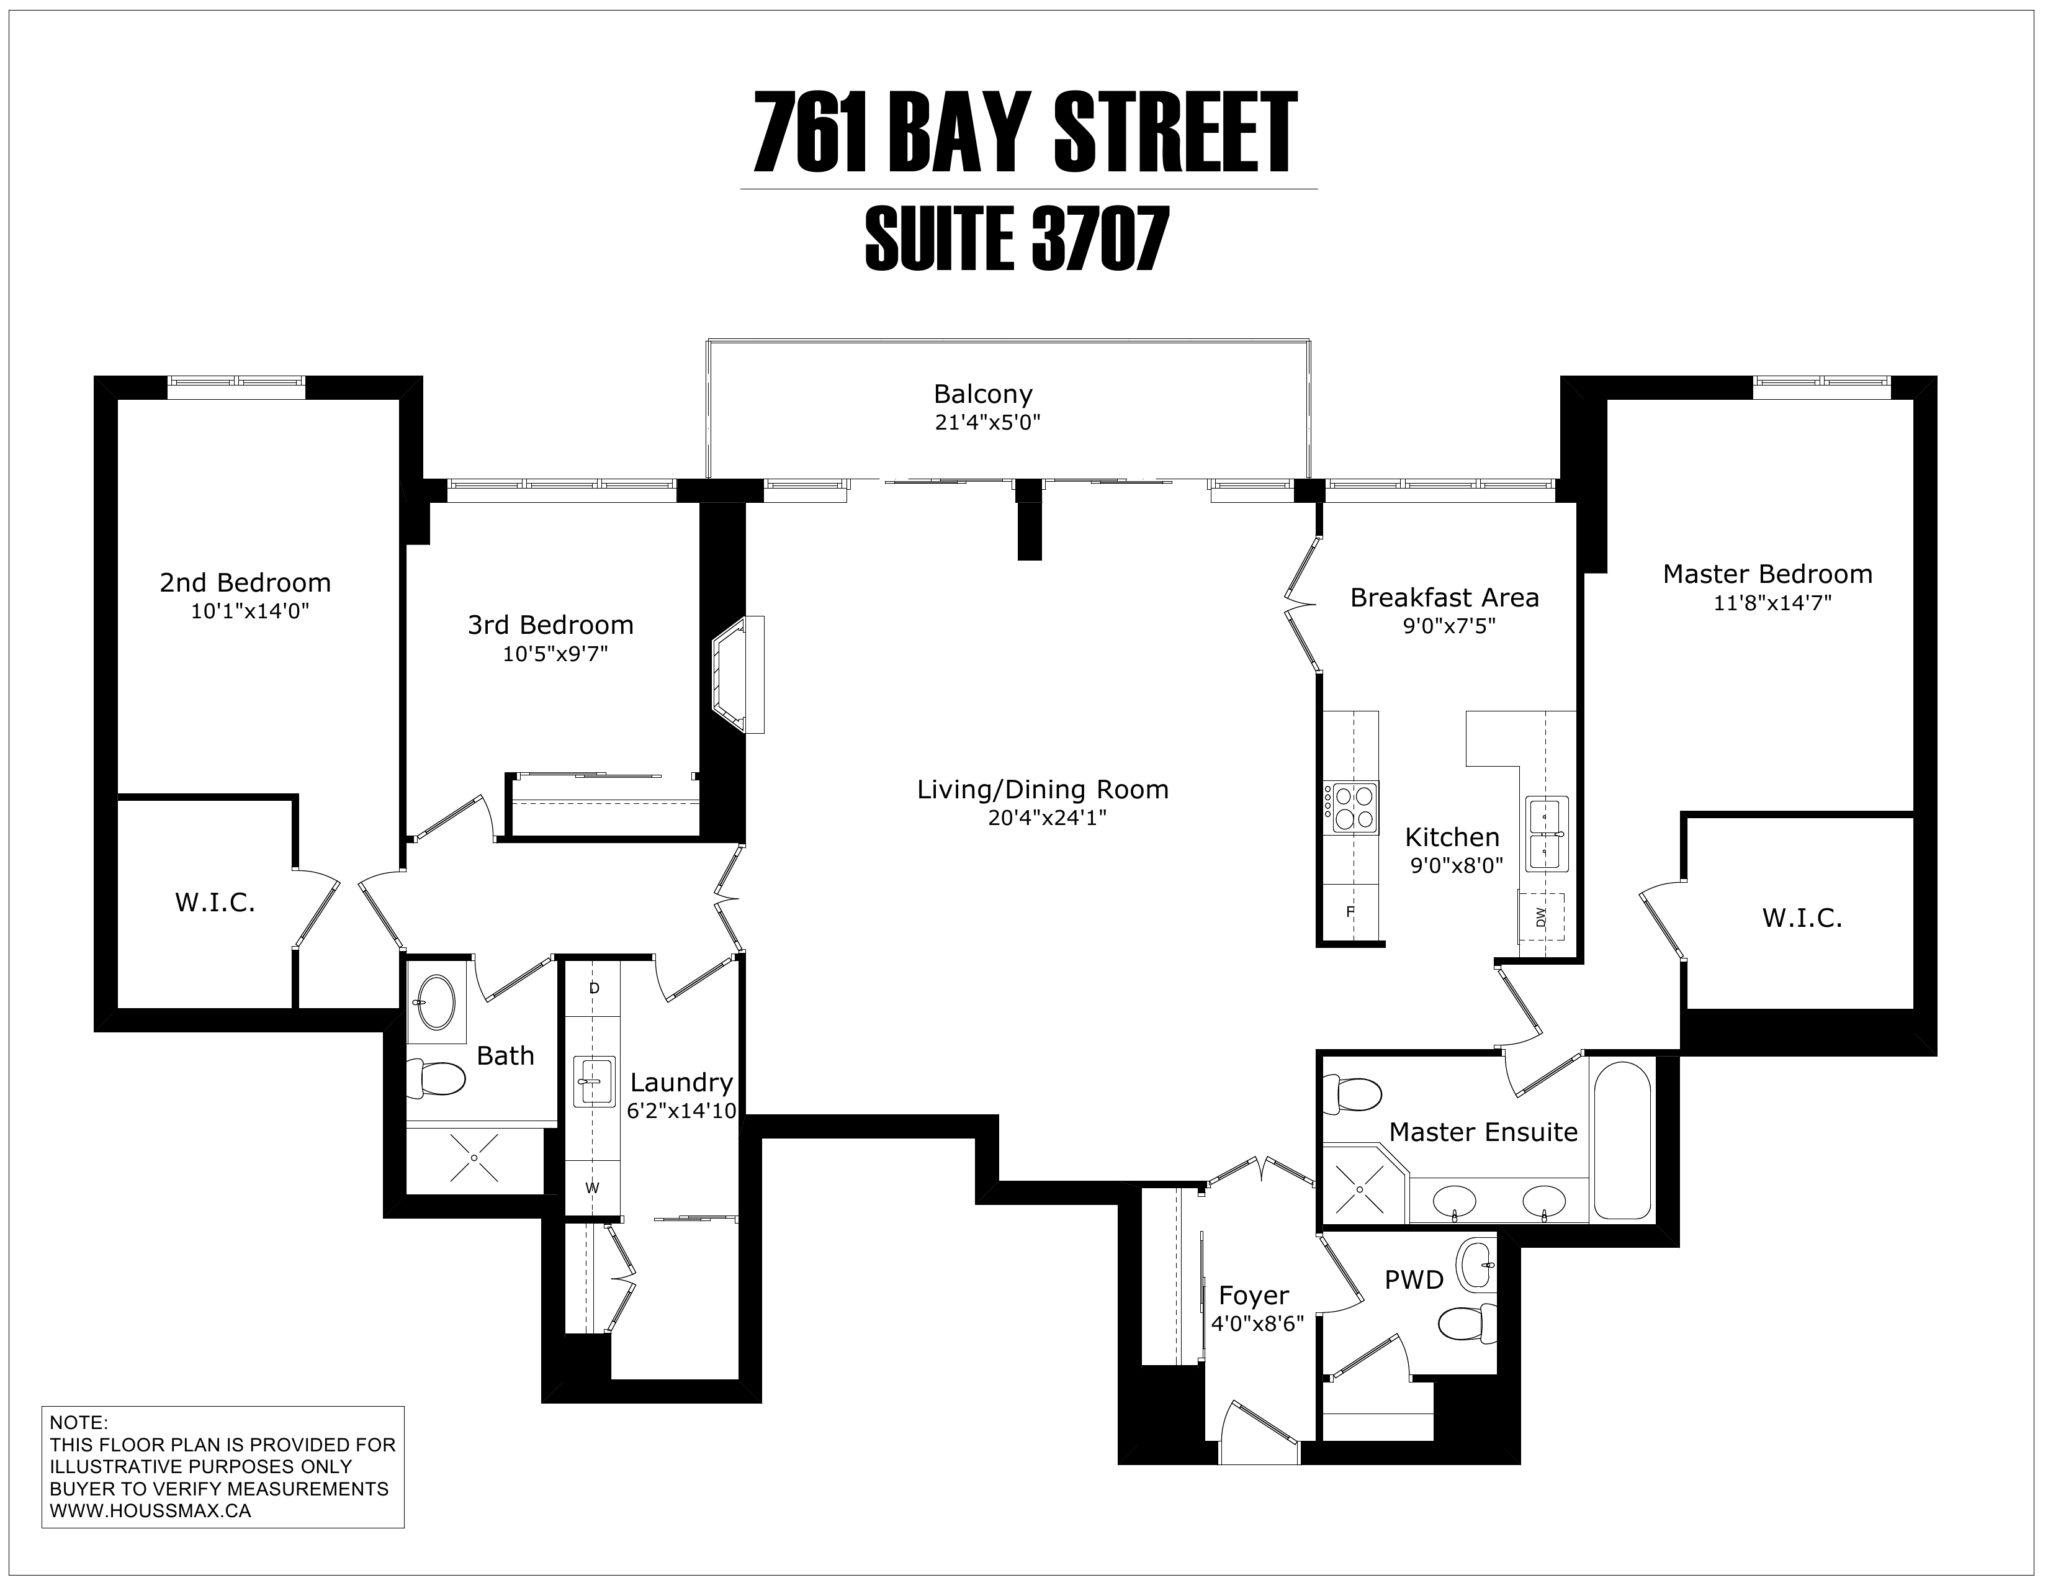 761 Bay Street - Unit 3707 - Floor Plans